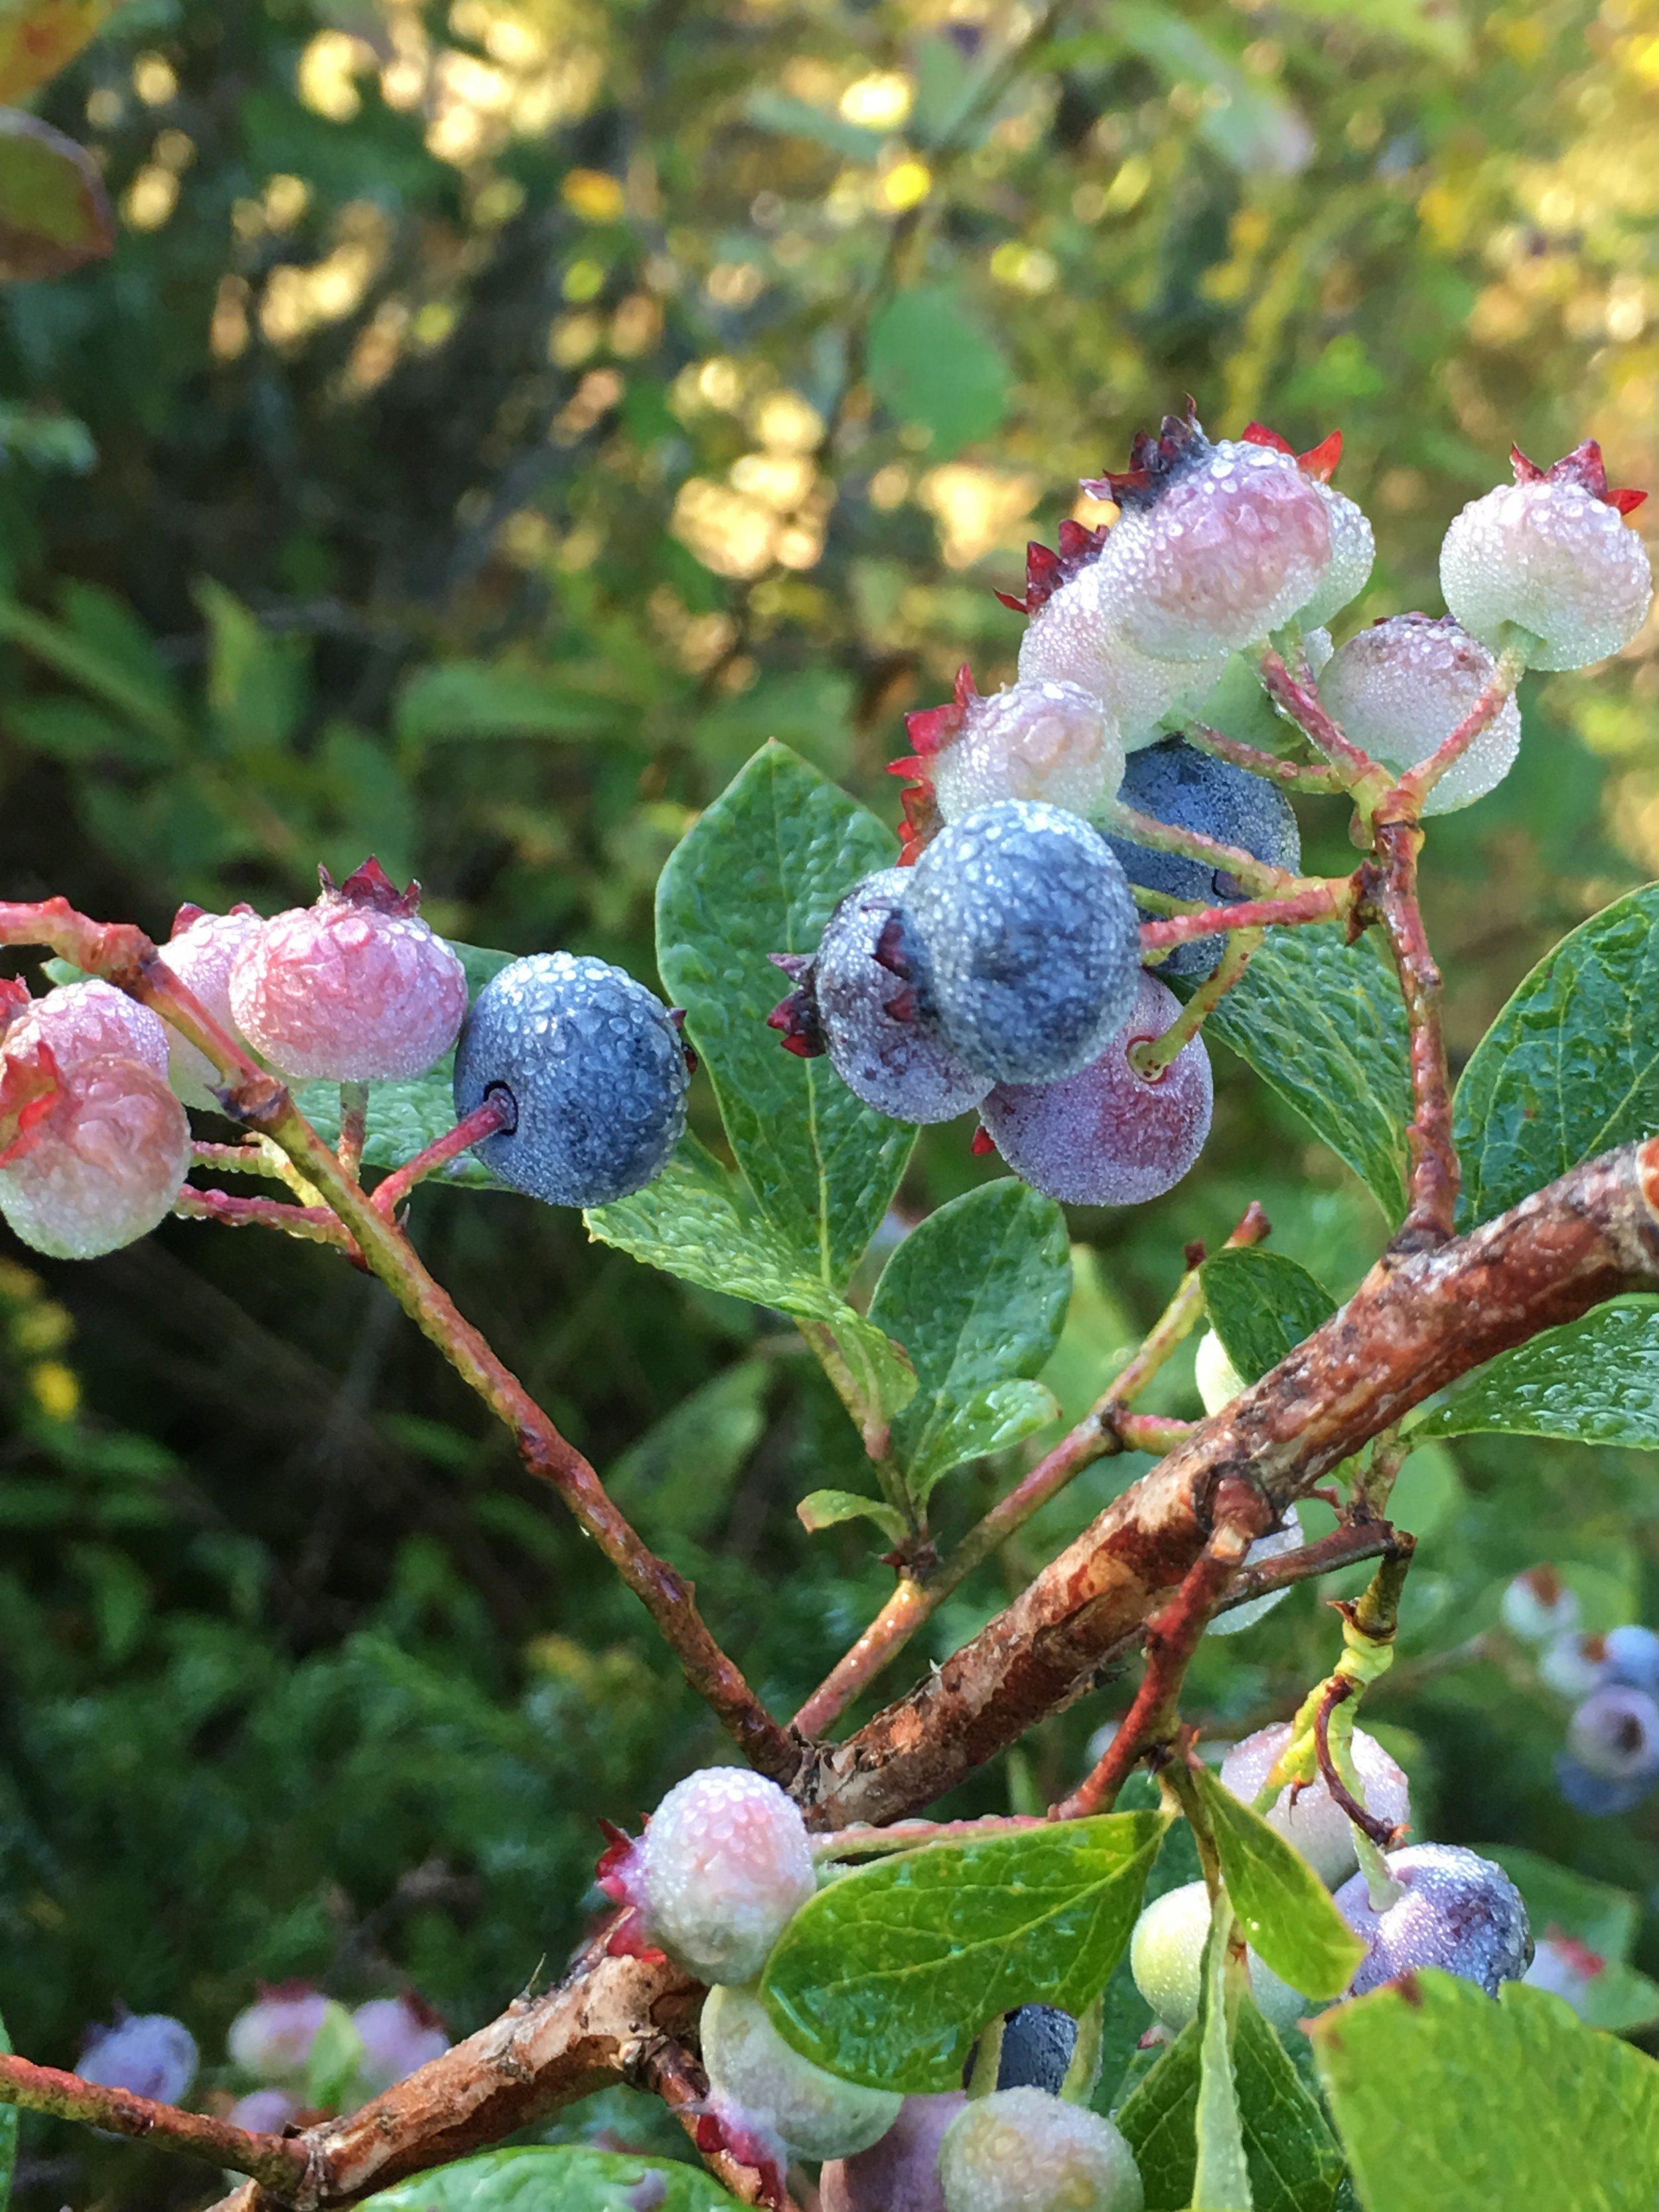 Dew on blueberries